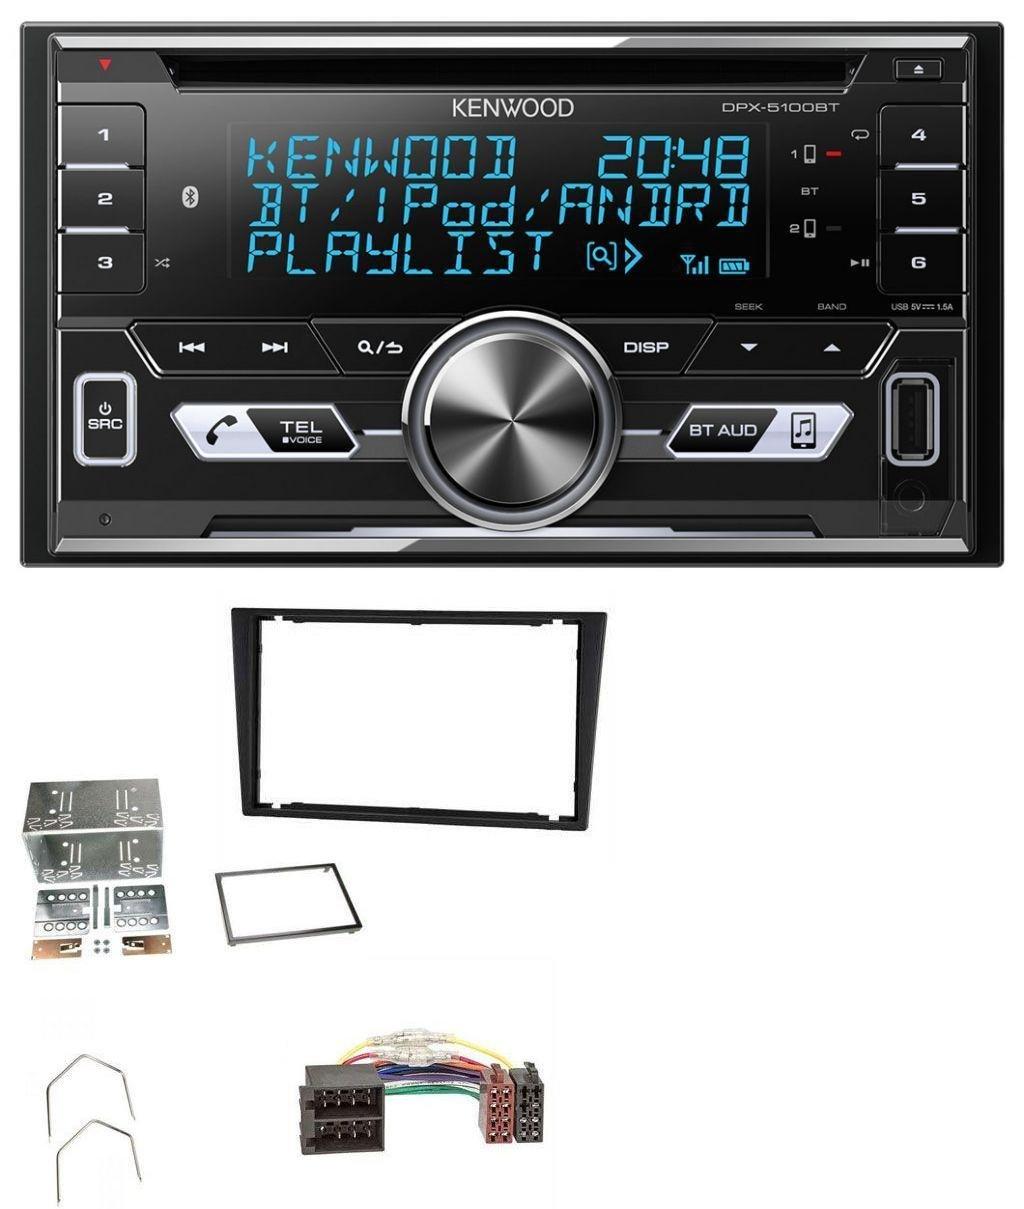 Kenwood DPX-5100BT Aux CD 2DIN MP3 Bluetooth USB Autoradio fü r Opel Corsa C Meriva Signum Vectra B 00-04 Charcoal caraudio24